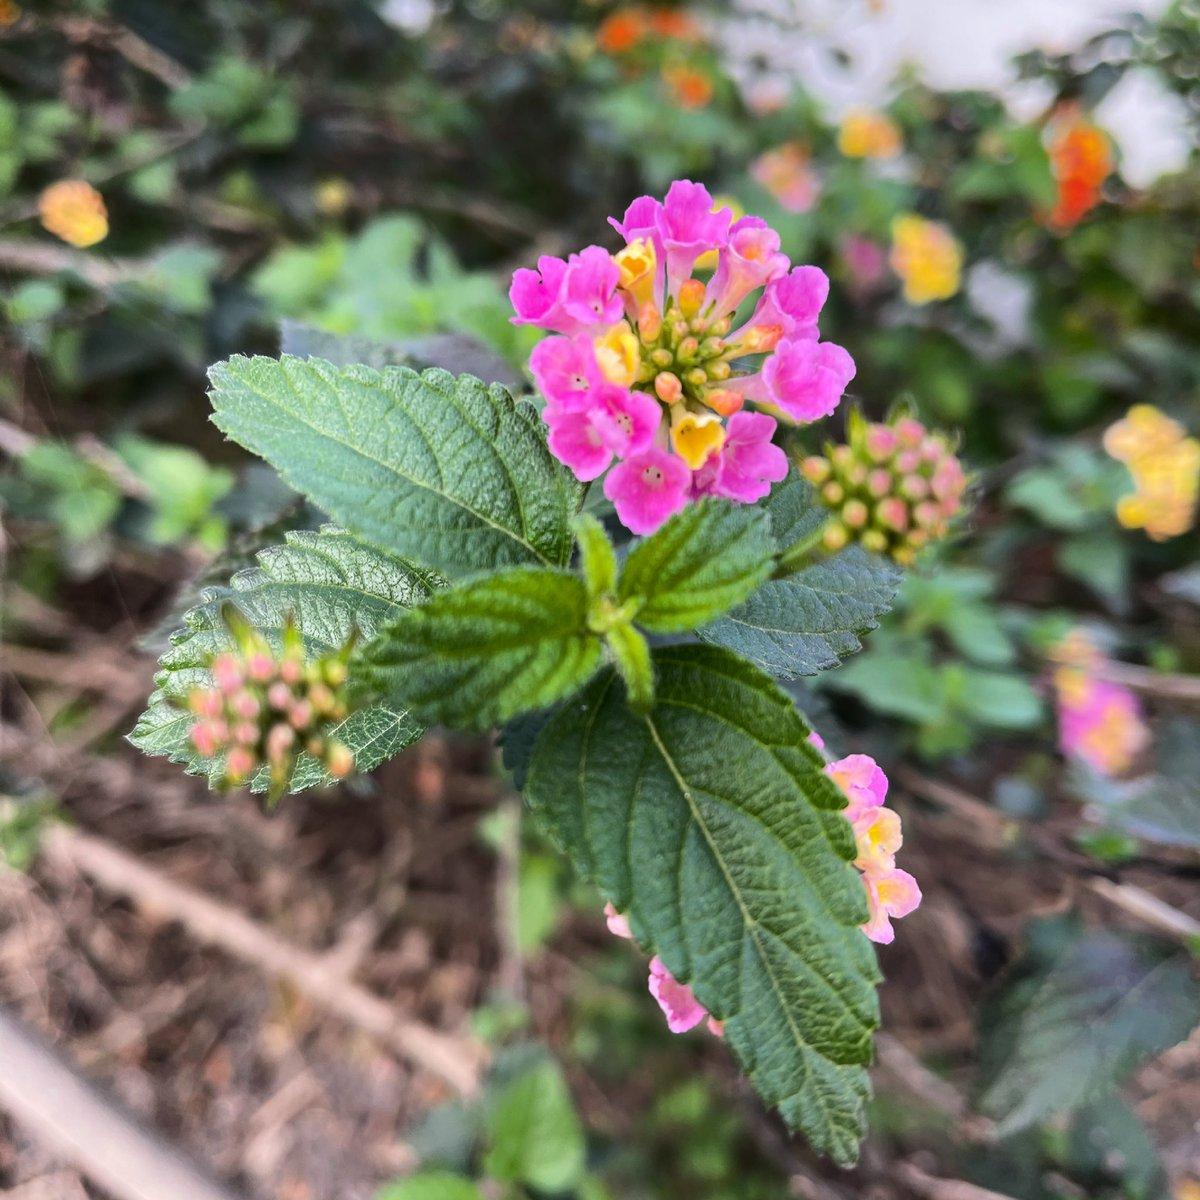 #flores #flowers #primavera2021 #primaveraanticipada #jerez #andalucia #andalucia_photos #spain #picoftheday